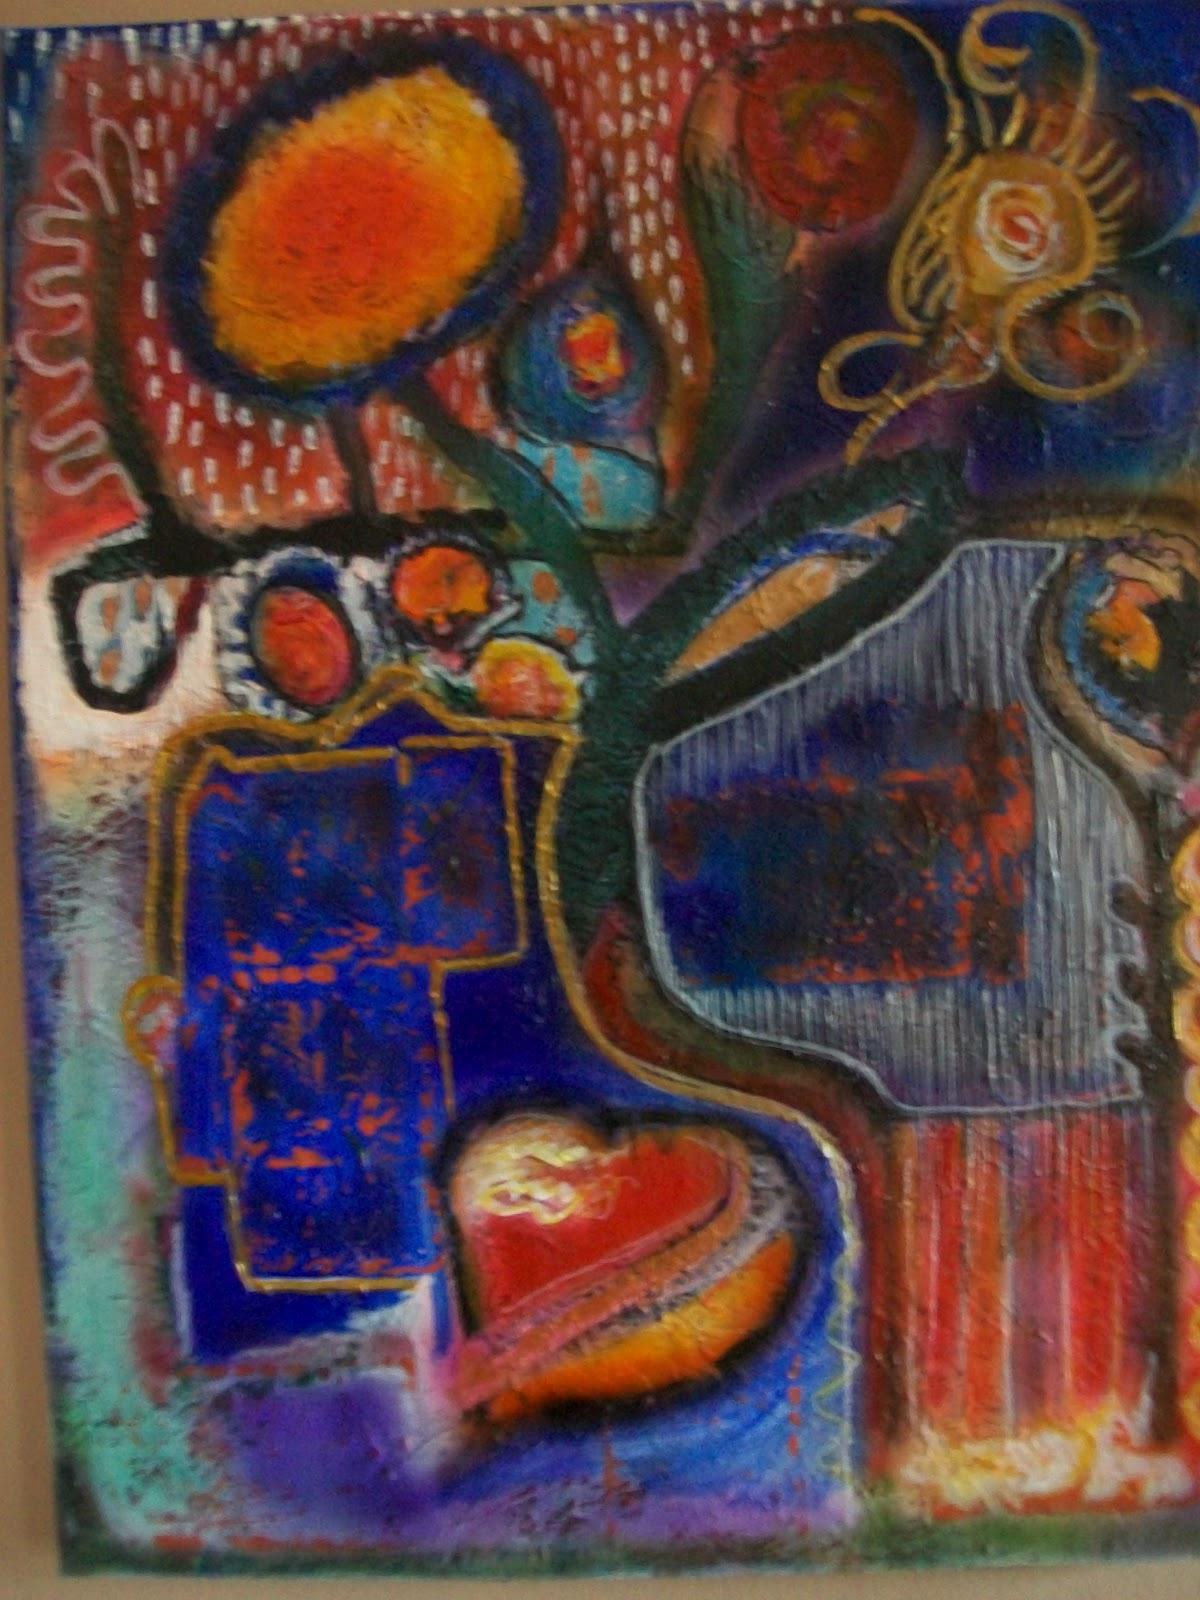 Barbara Pagani's Tresor Cache 101: Flora Bowley's New Book